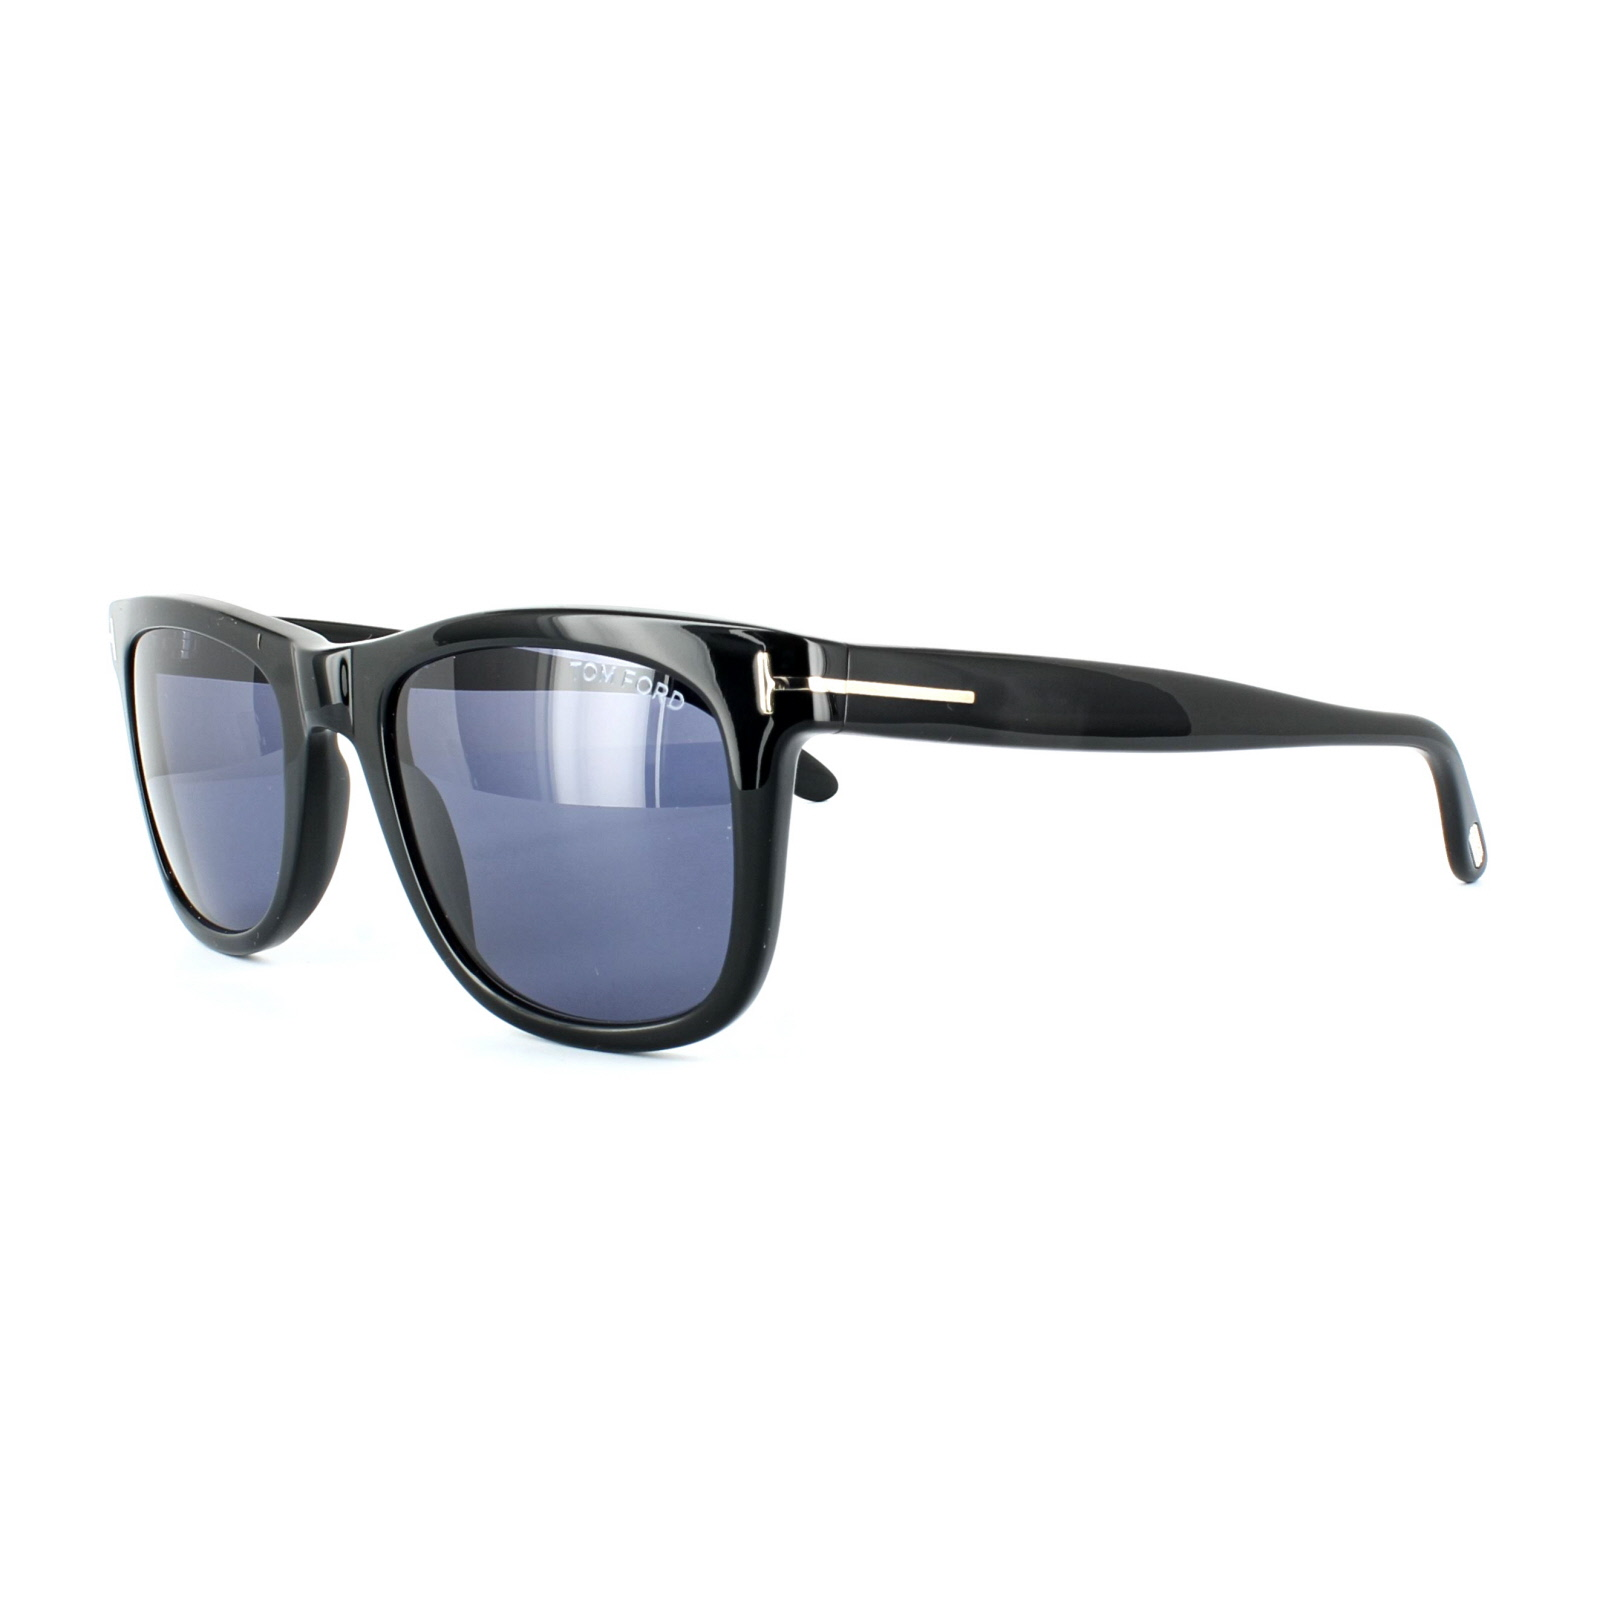 7018d82b707ee Tom Ford Sunglasses 0336 Leo 01V Shiny Black Blue 664689602902